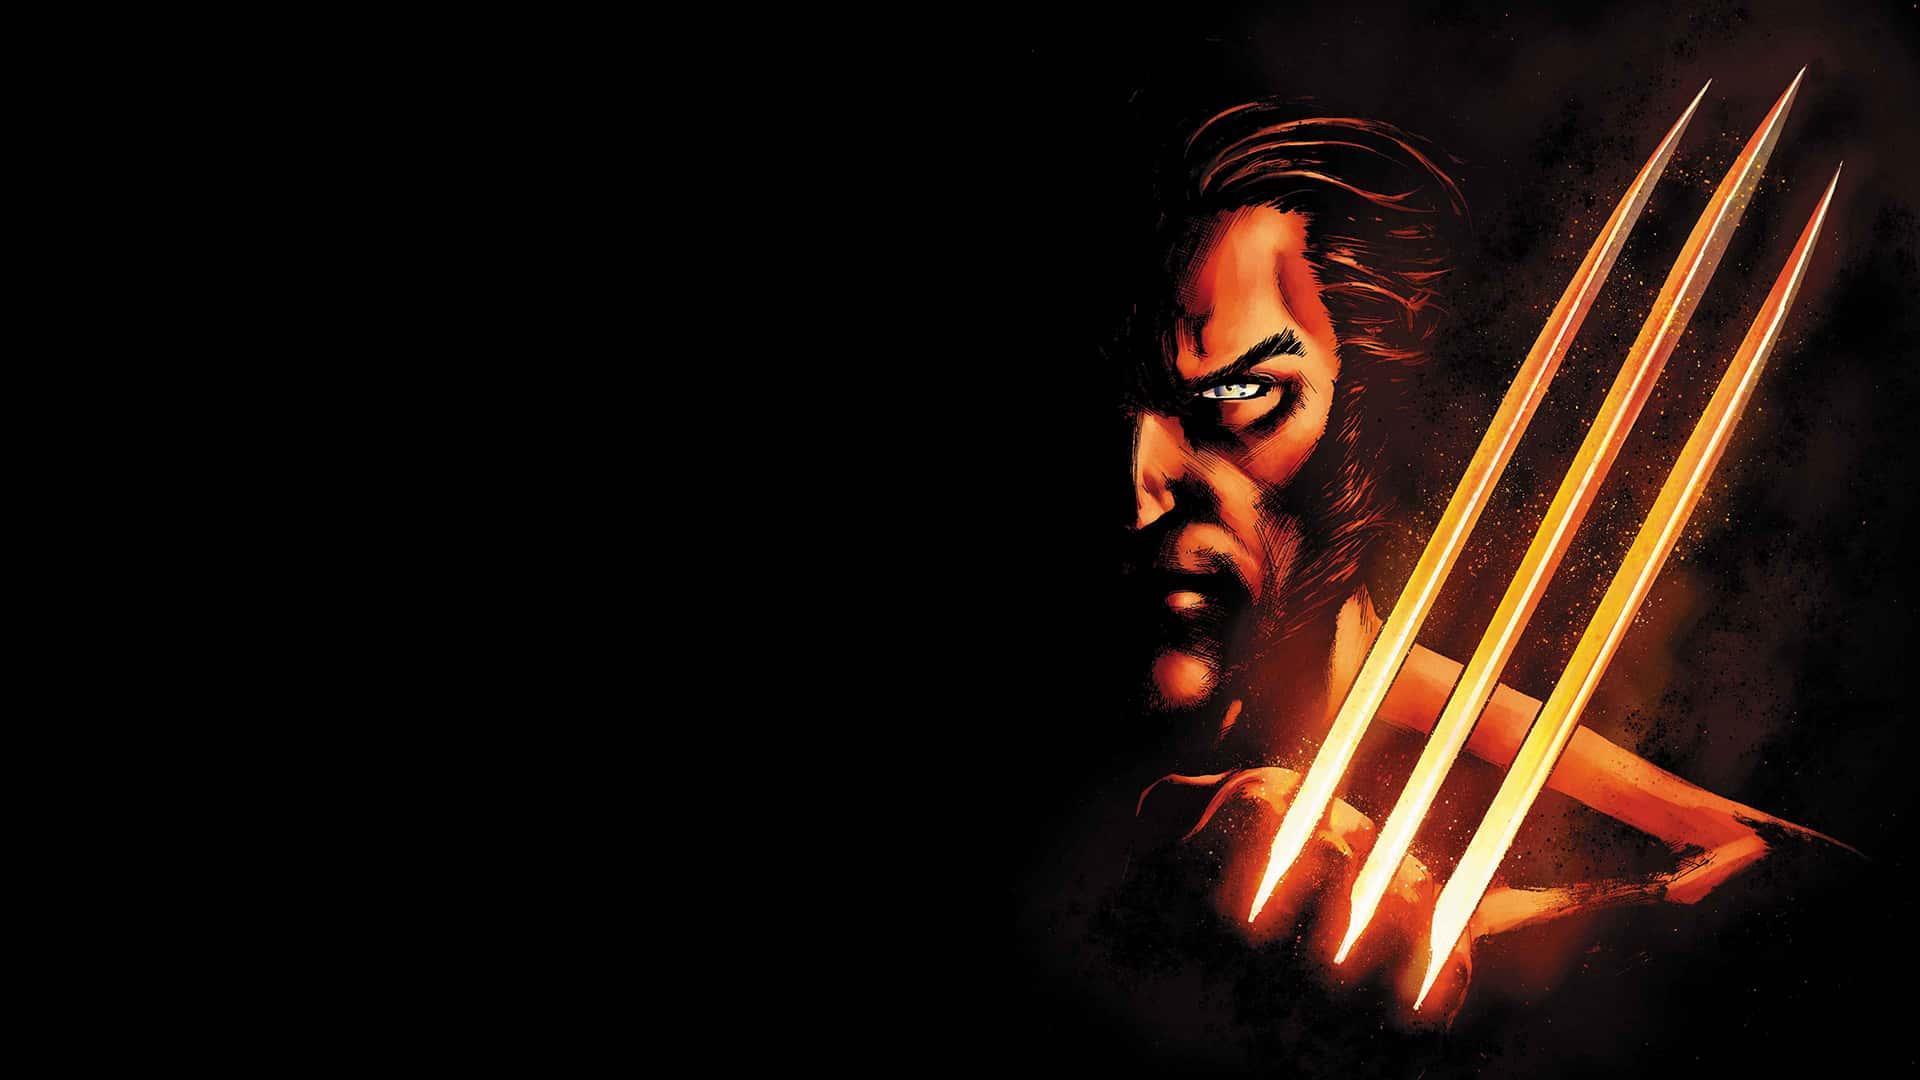 Создатели Человека-Паука анонсировали Marvel's Wolverine